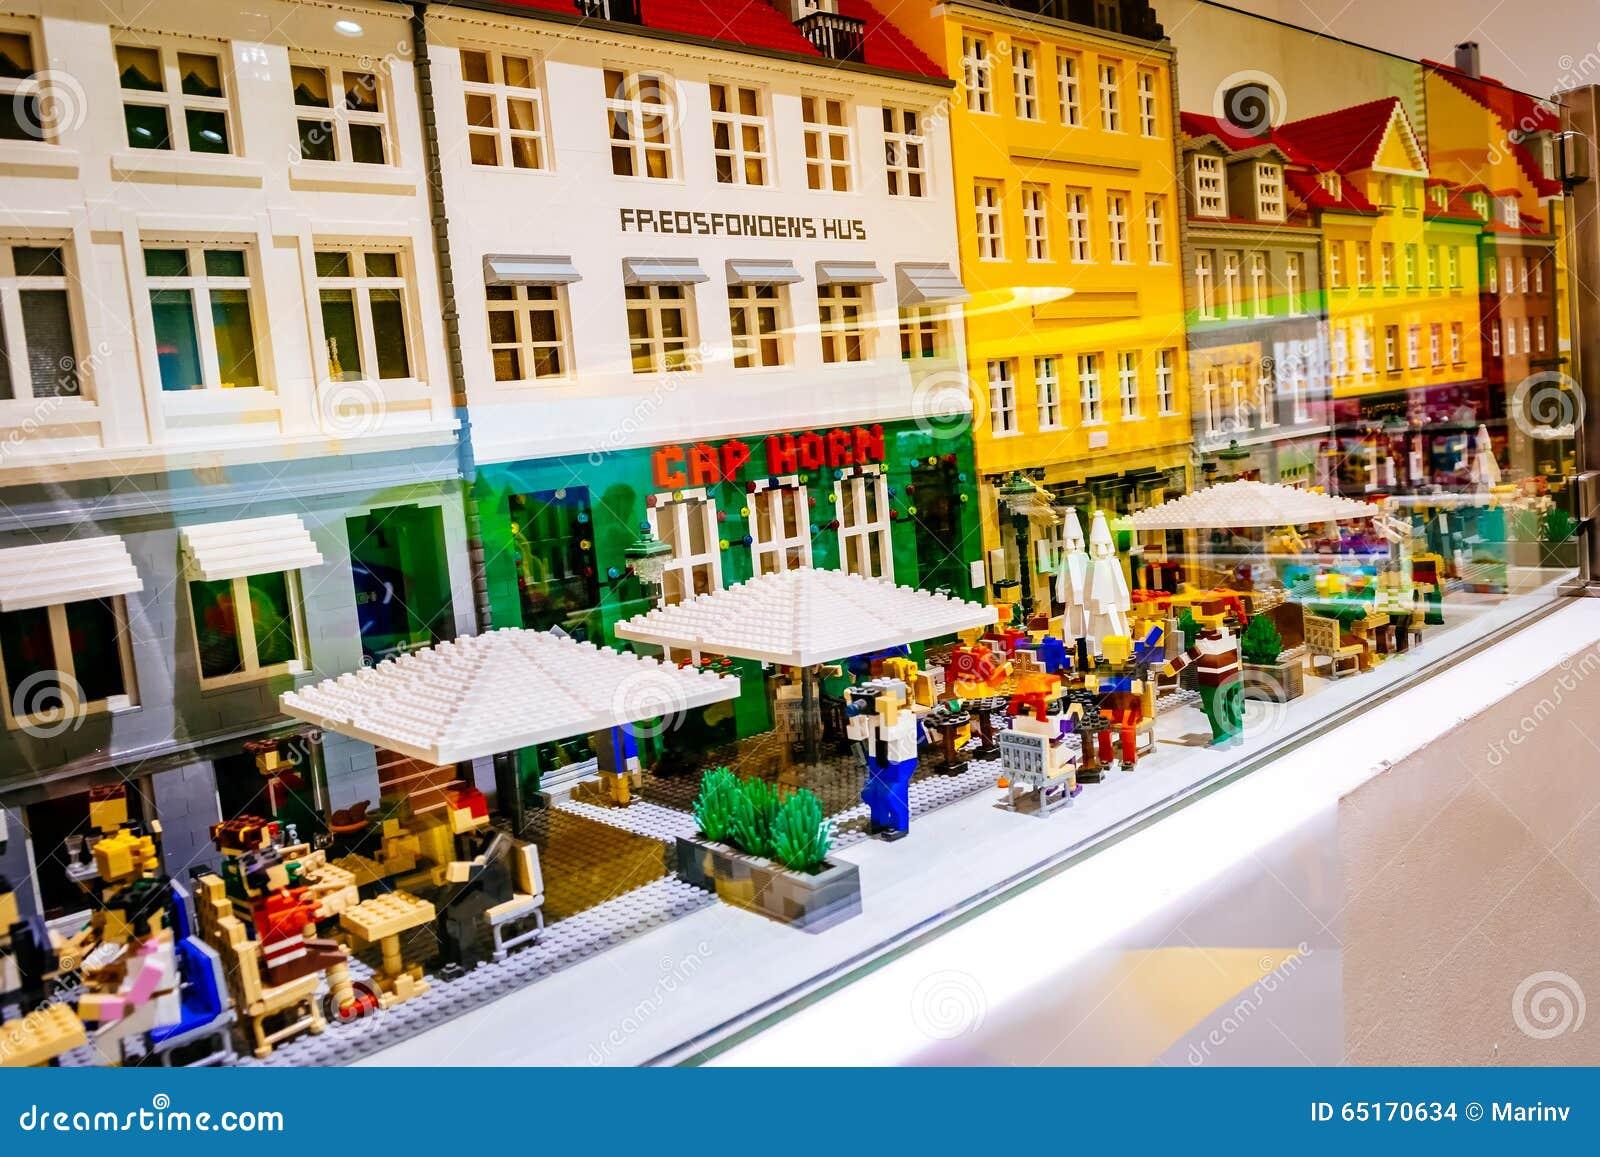 lego figurines and forms the lego store showing nyhavn neighborhood in copenhagen denmark. Black Bedroom Furniture Sets. Home Design Ideas